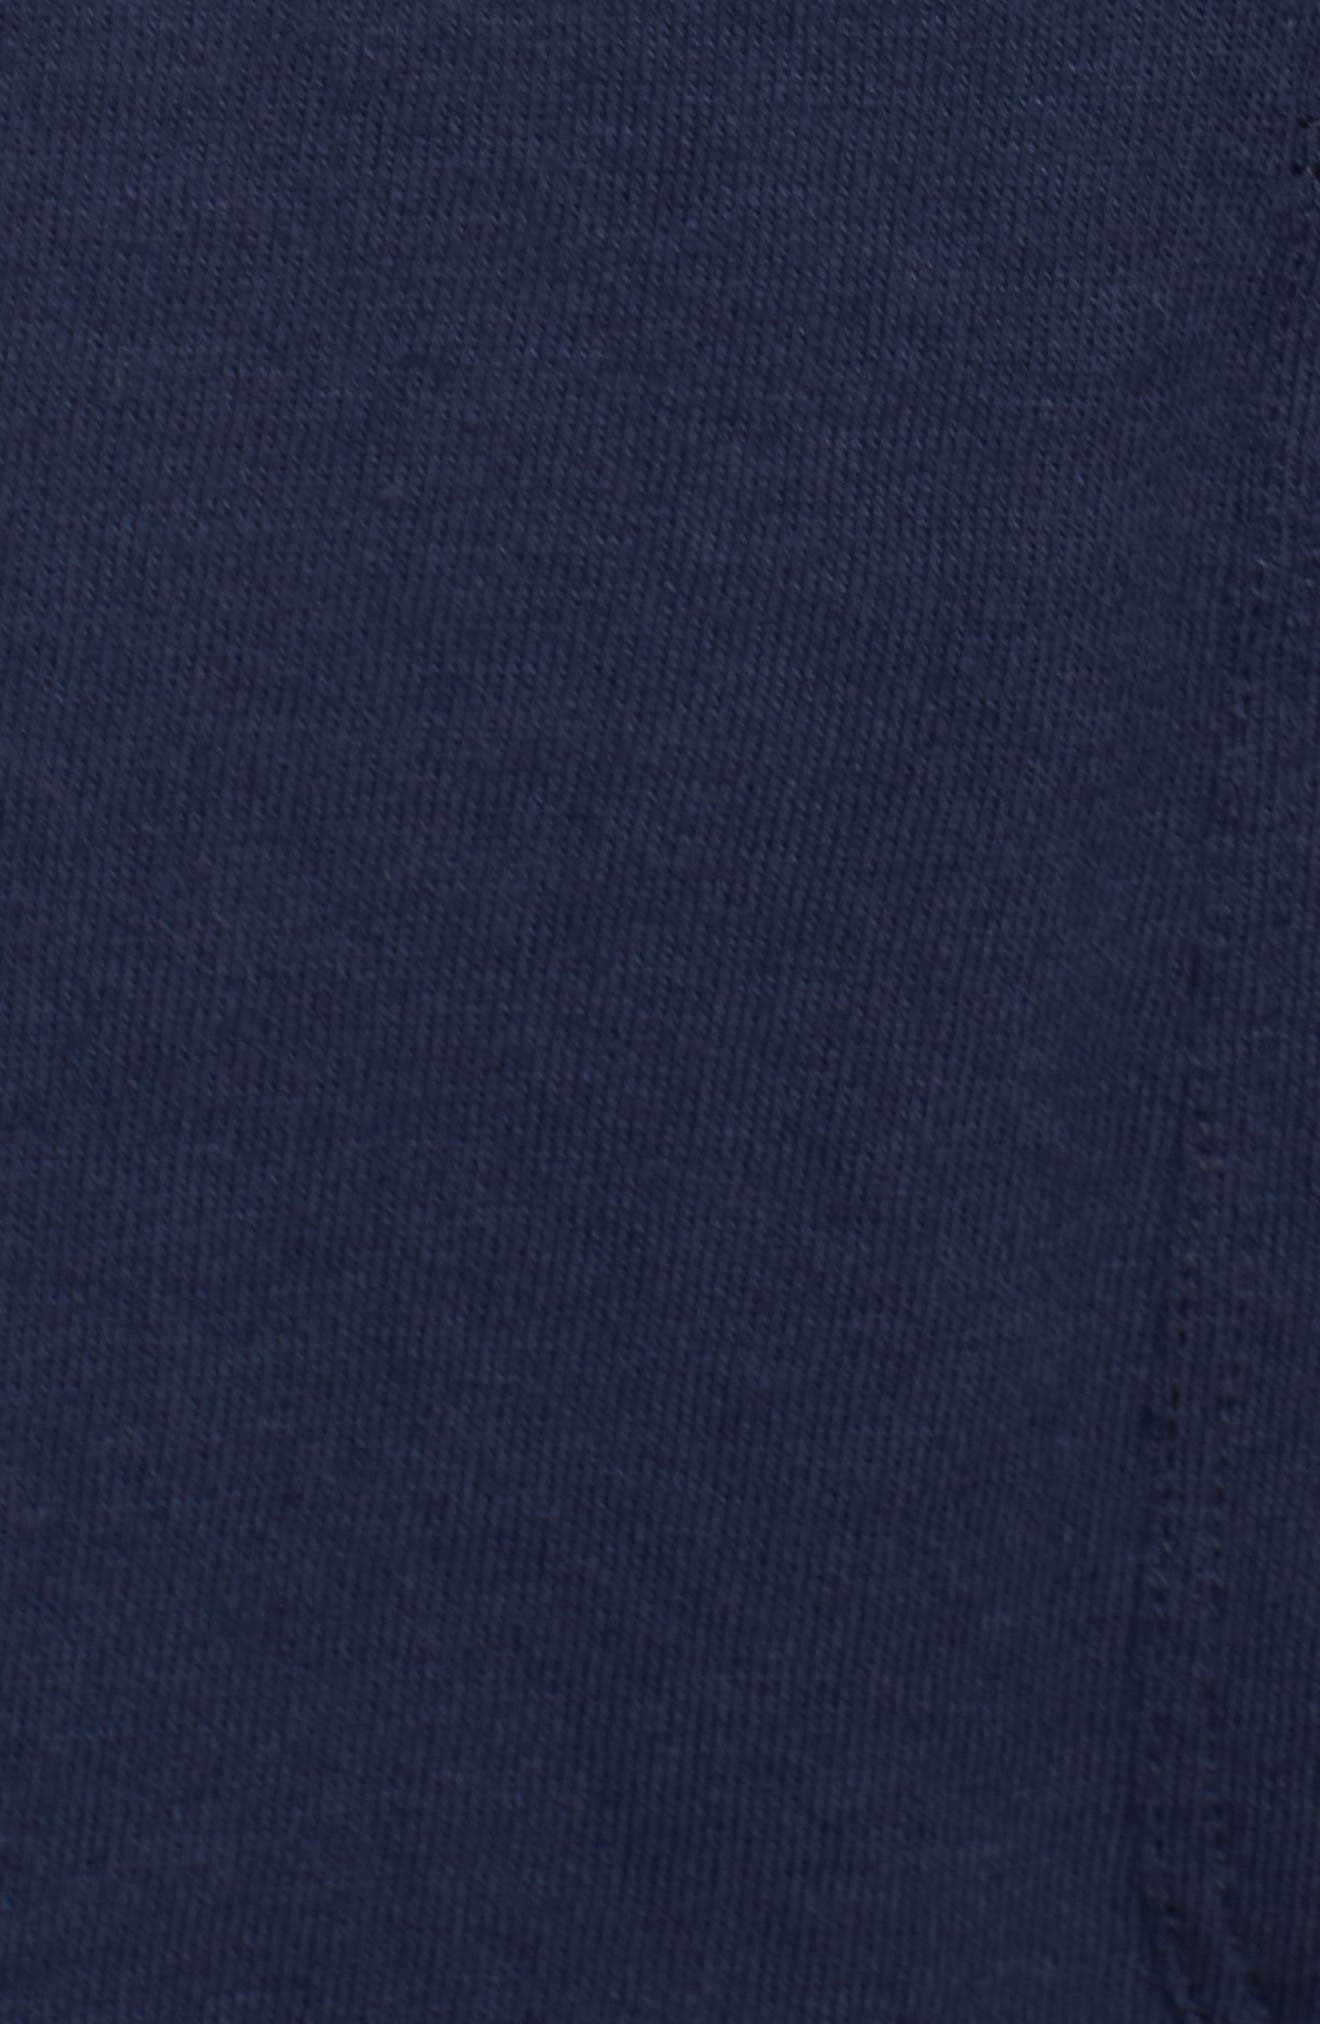 CASLON<SUP>®</SUP>, Double Pocket Knit Blazer, Alternate thumbnail 7, color, NAVY PEACOAT